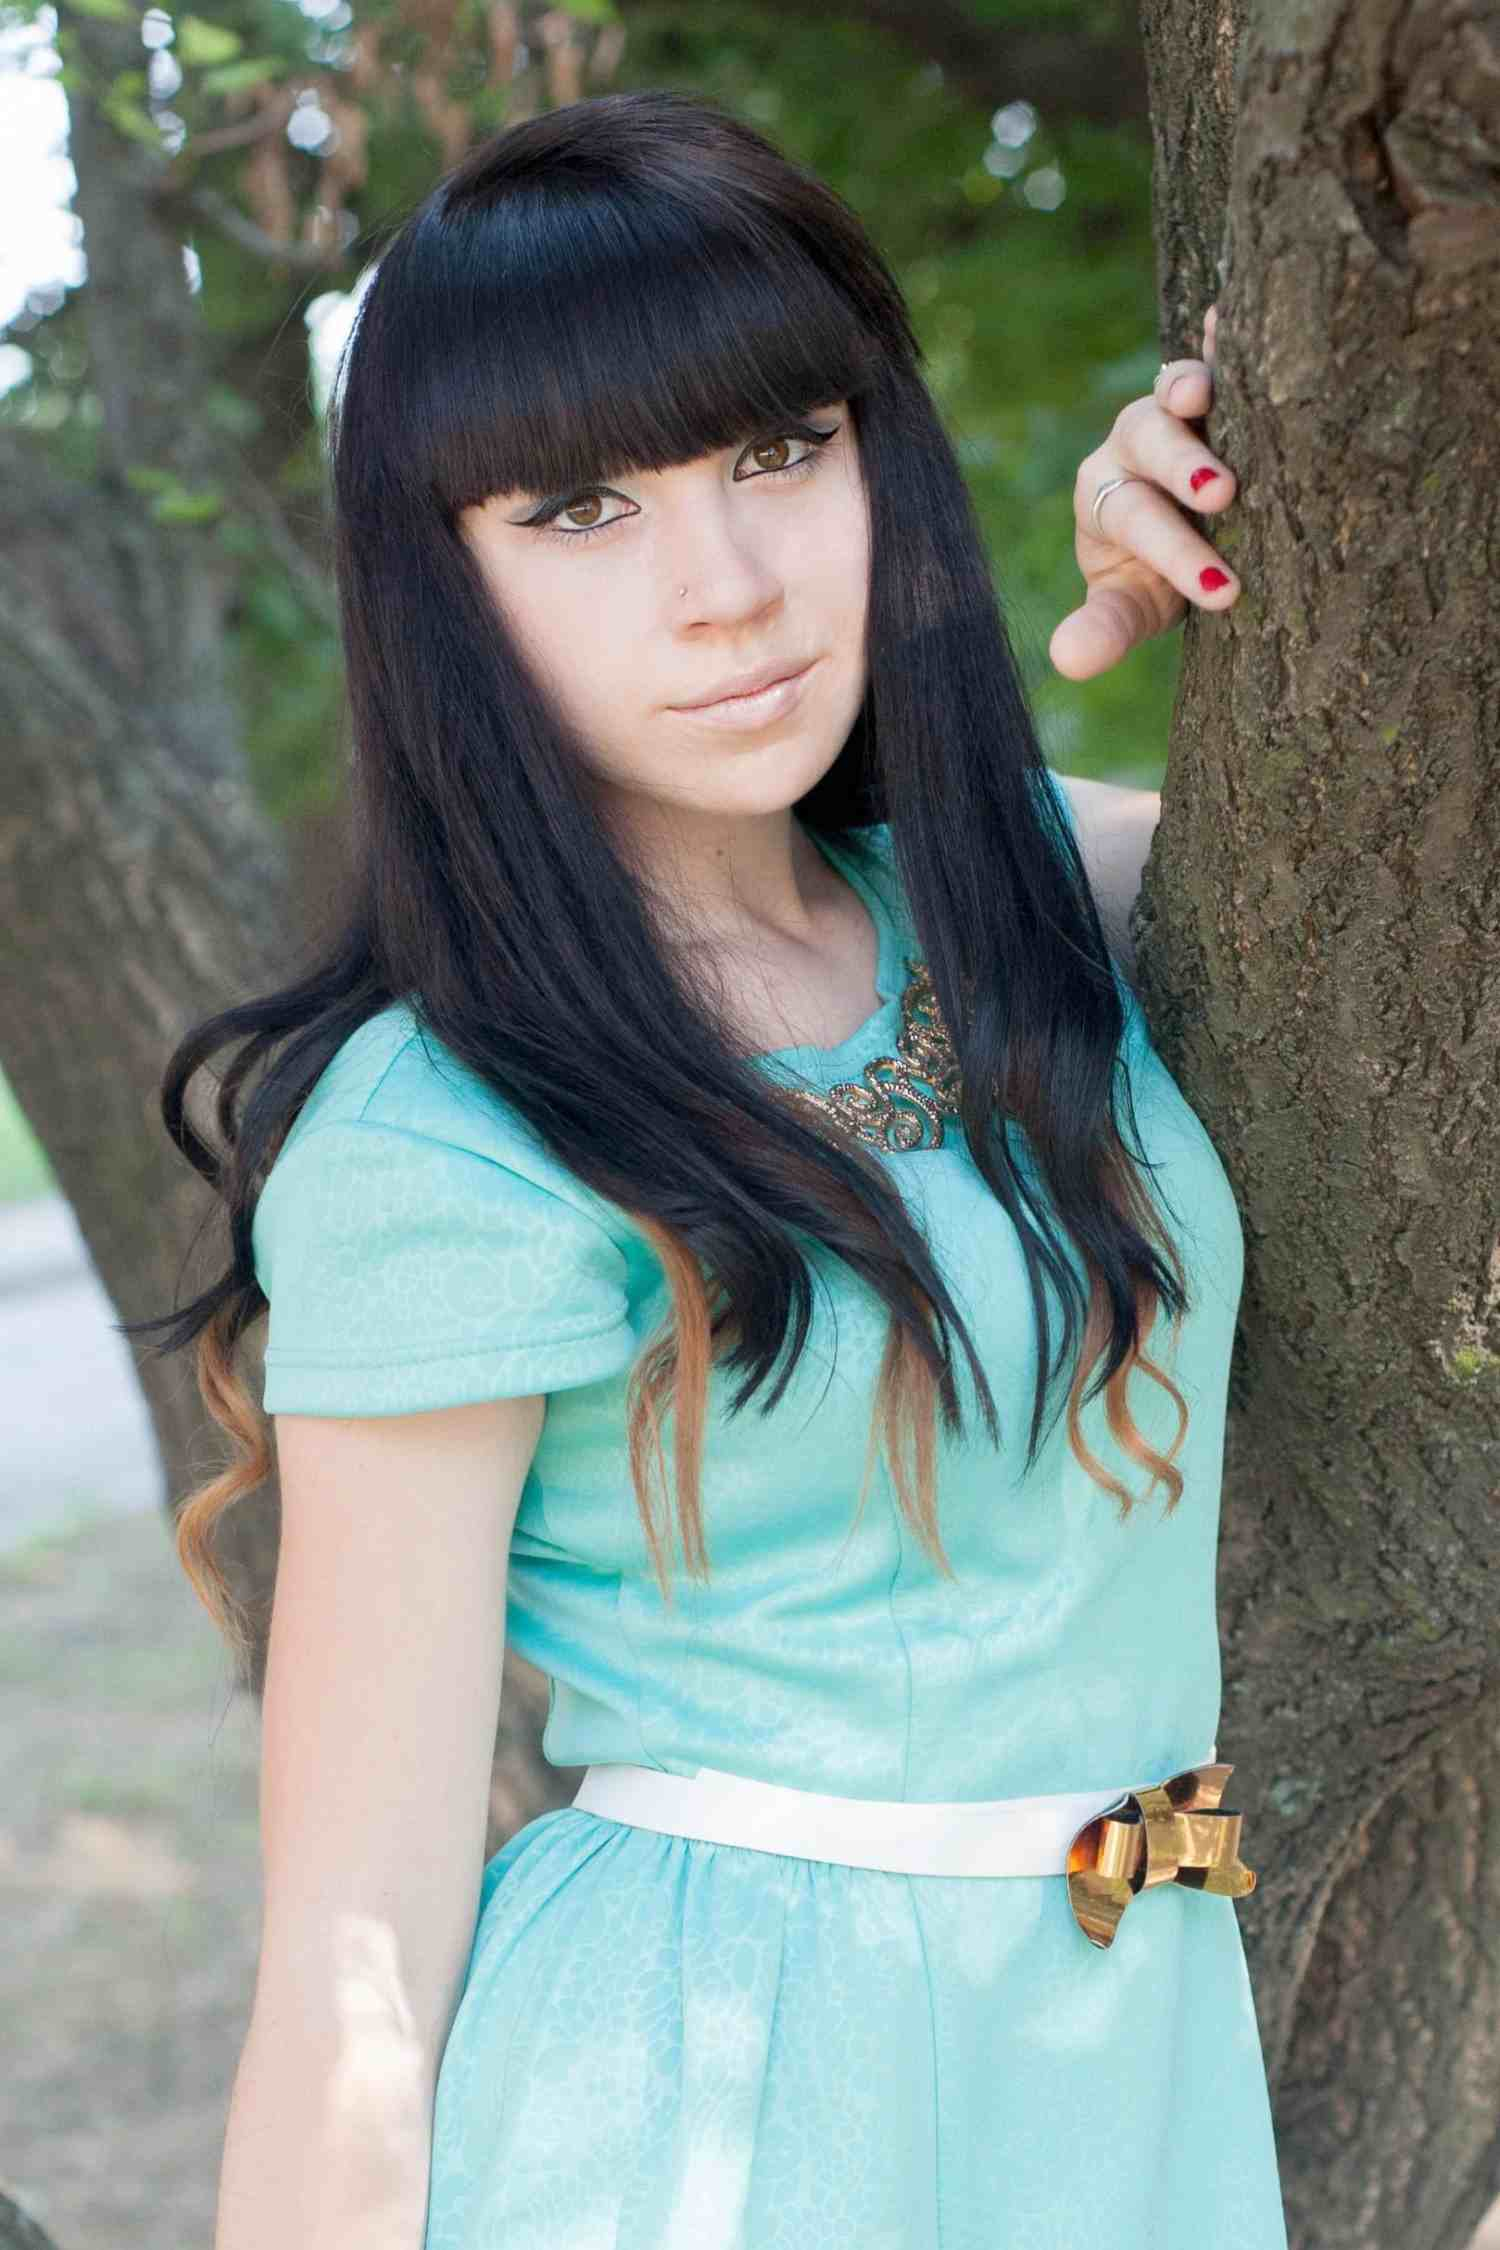 Nickyelle